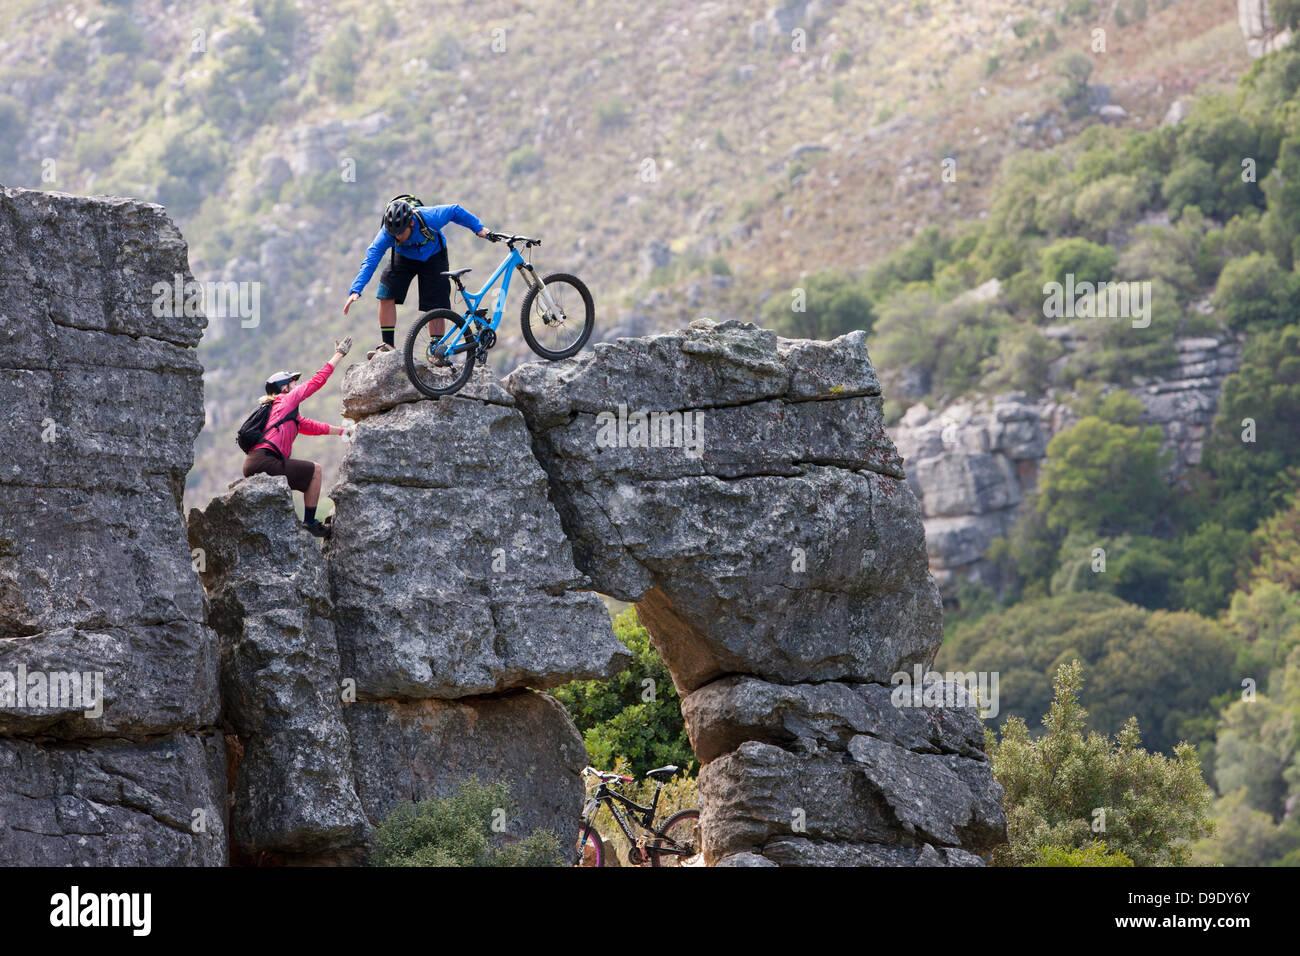 Mountain biking couple climbing rock formation - Stock Image